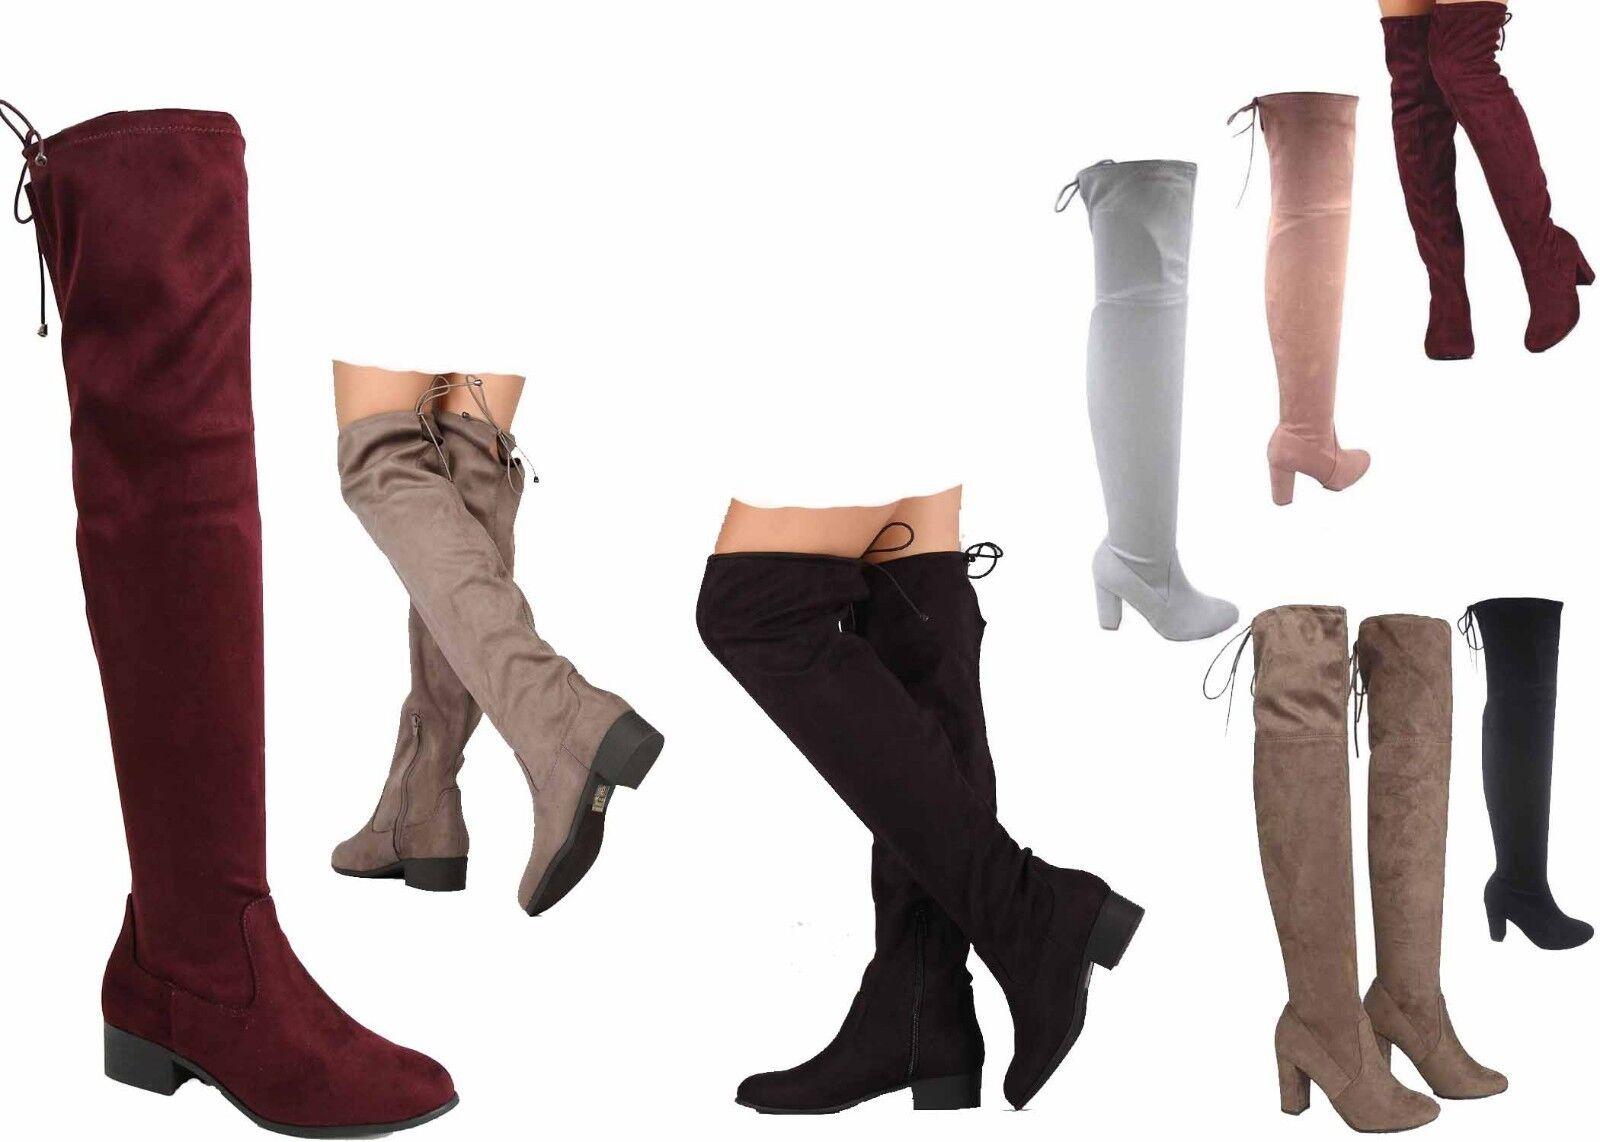 ca6bb2f449b Soda Women's Round Toe Thigh Knee High Low Heel High Heel Boots Shoes